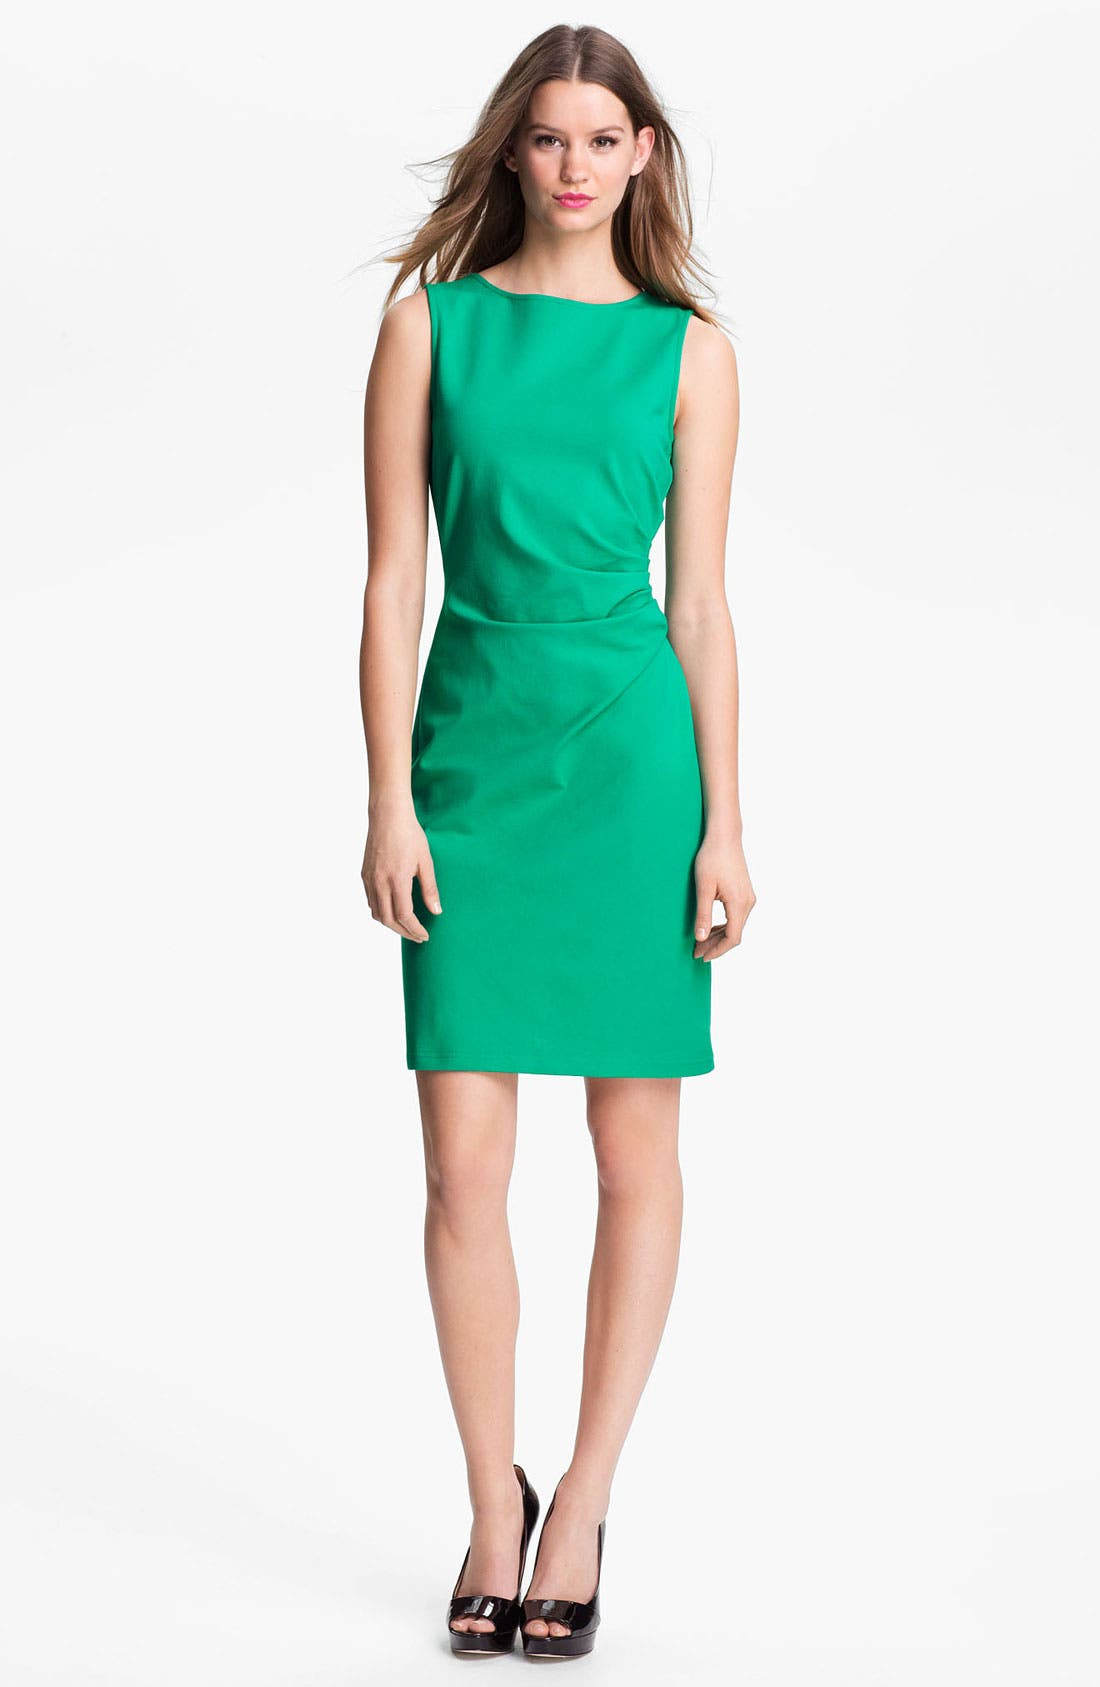 Main Image - Kenneth Cole New York 'Hilary' Dress